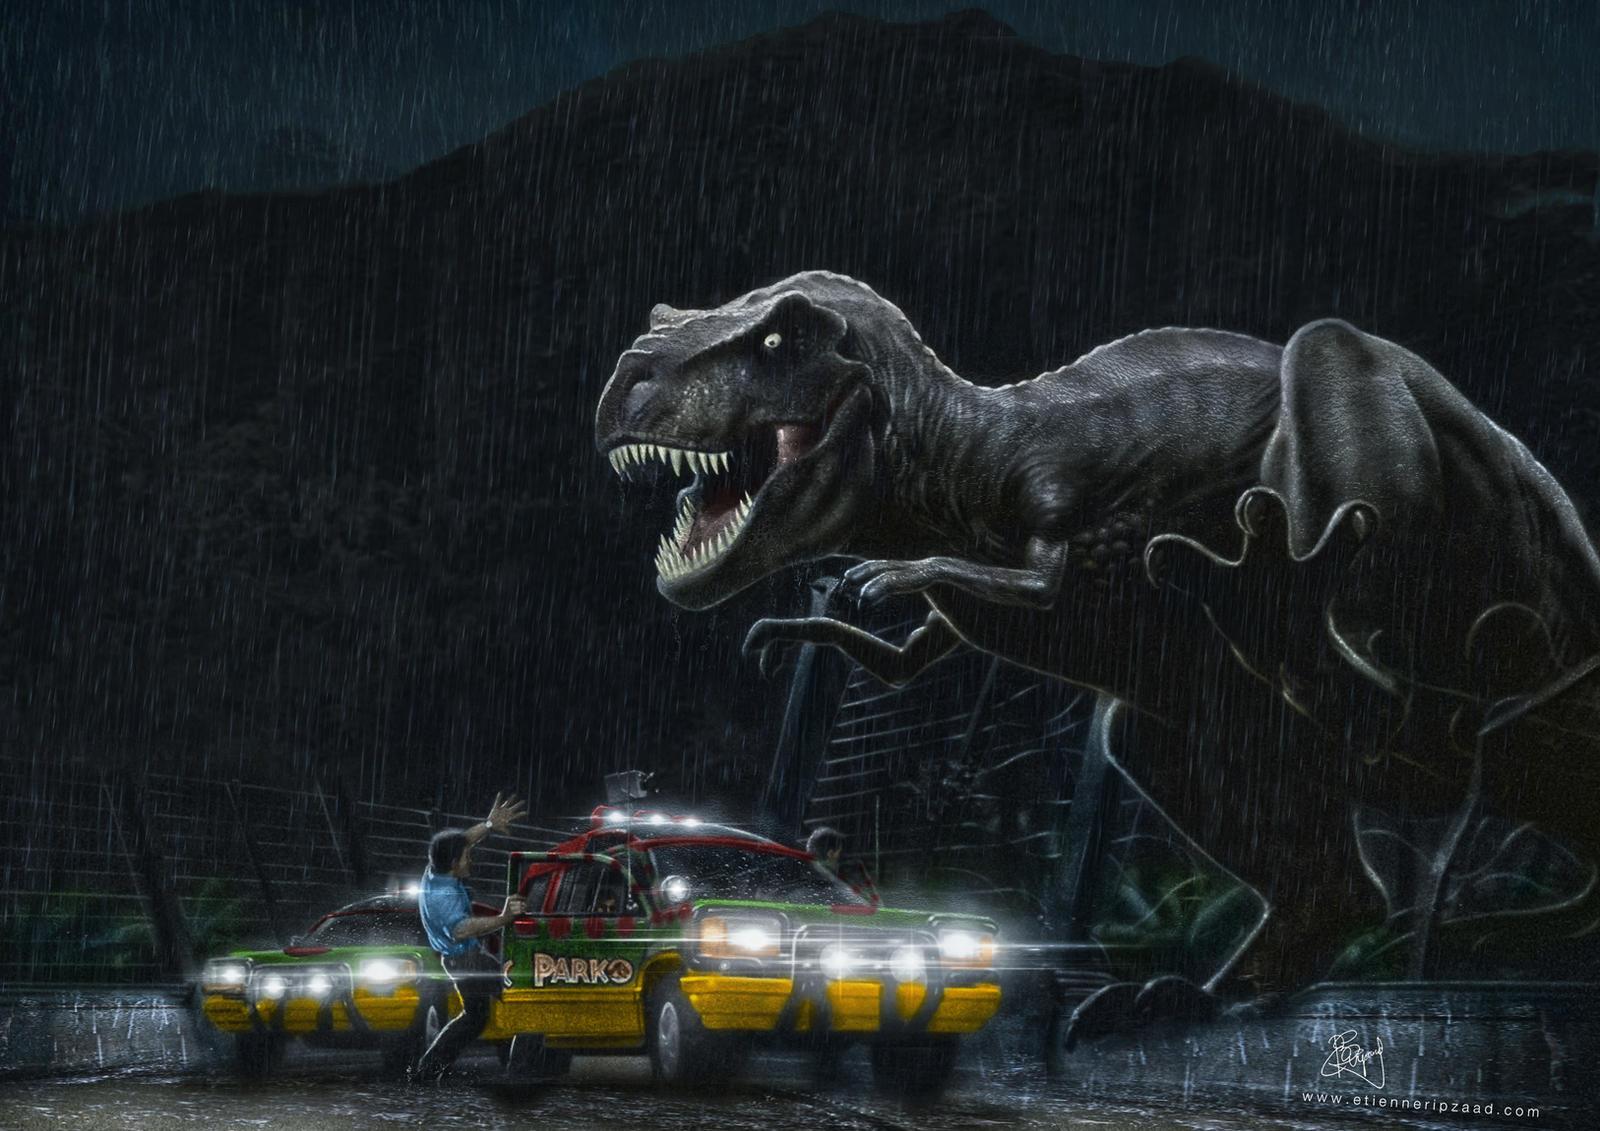 Jurassic park card 3 by chicagocubsfan24 on deviantart - Jurassic Park Tyrannosaurus Outbreak By Etienne Ripzaad